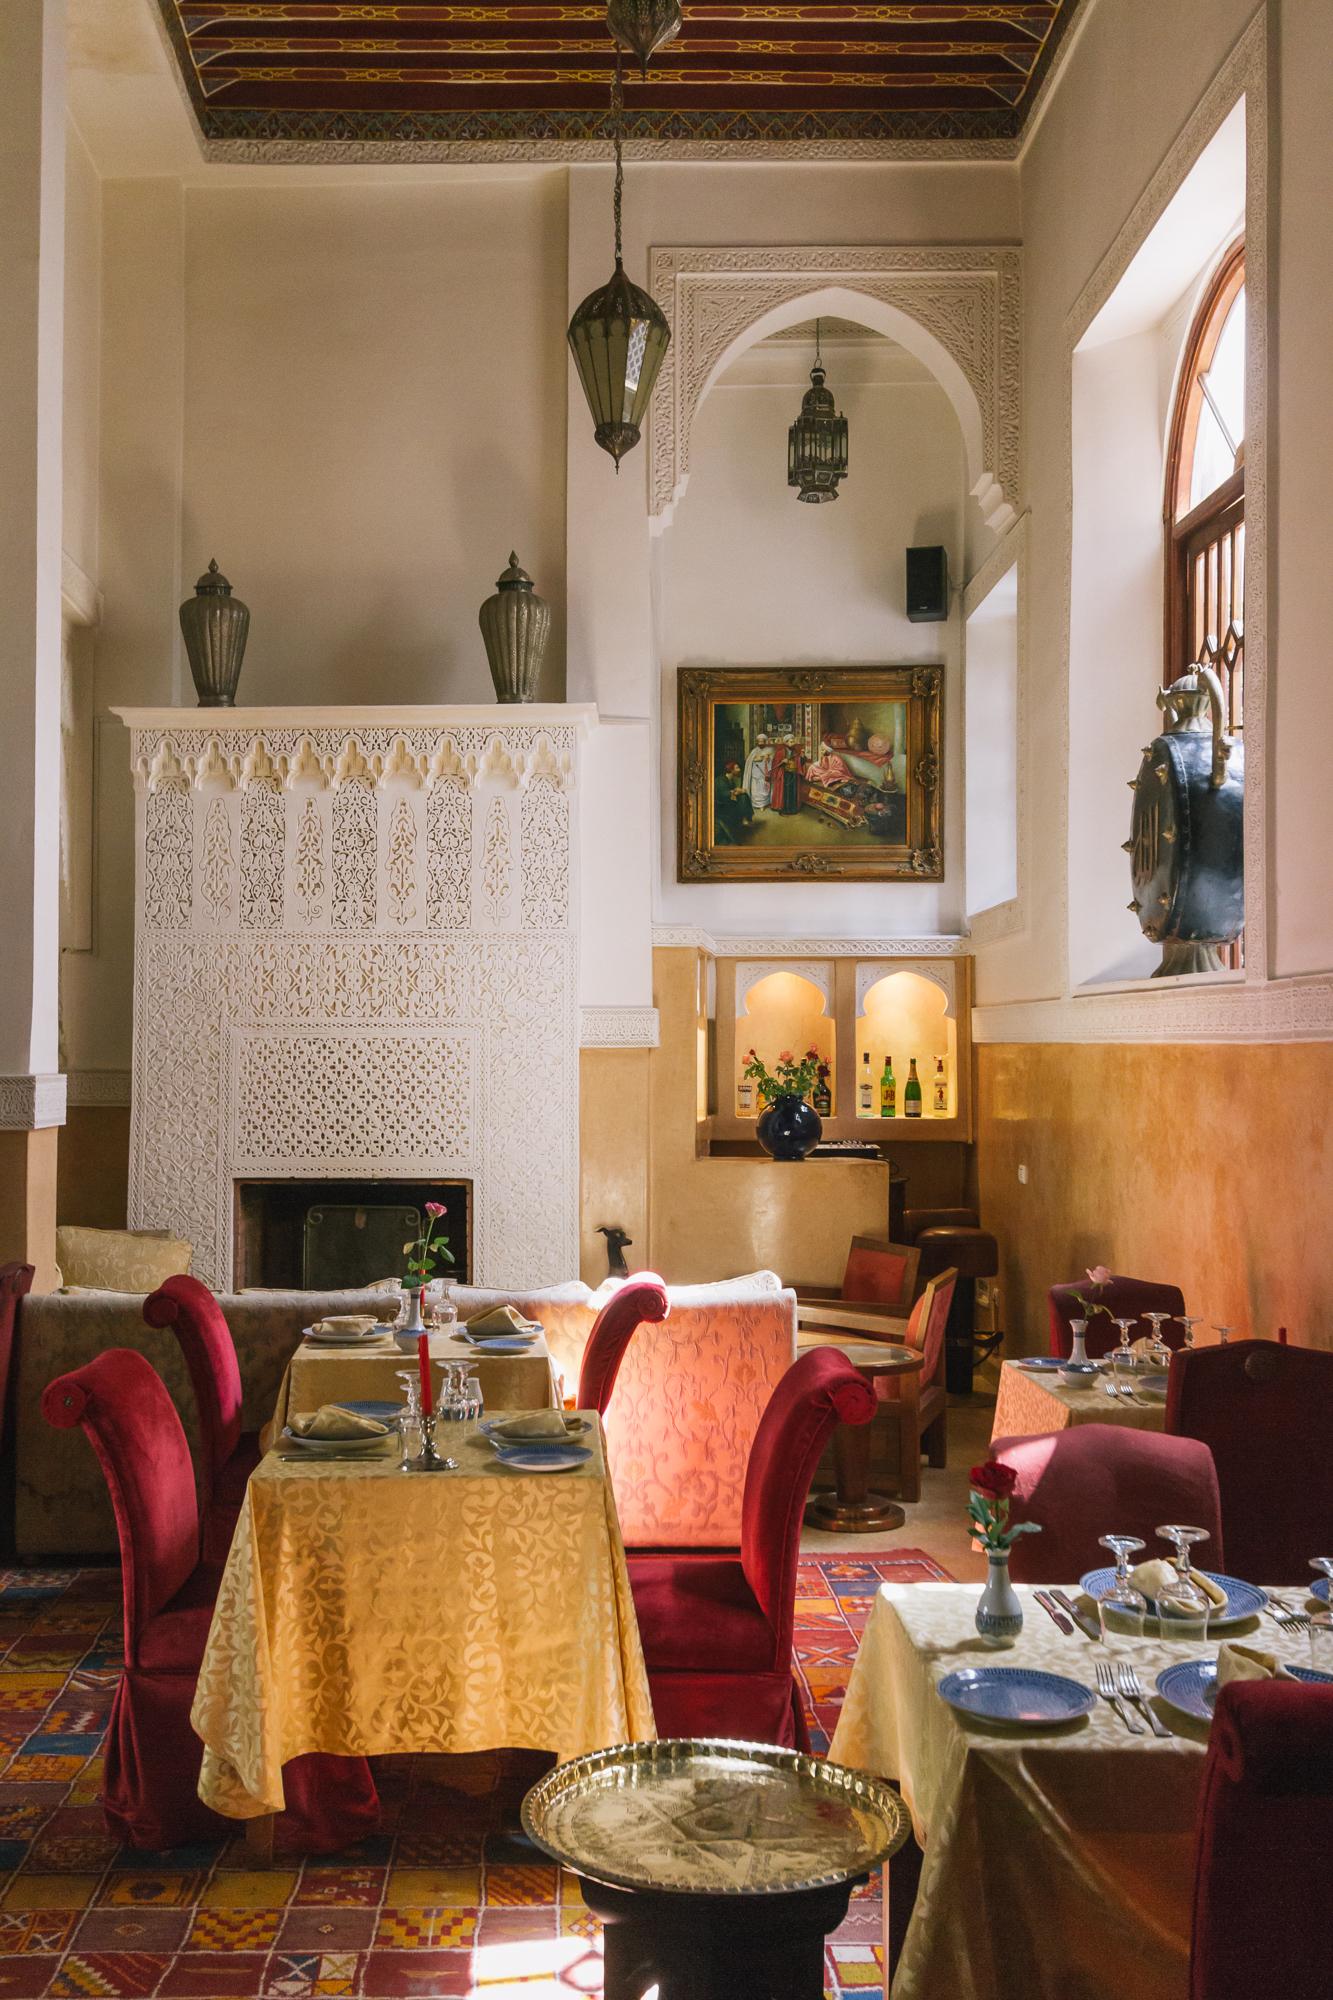 Esprit du Maroc's A la carte restaurant.